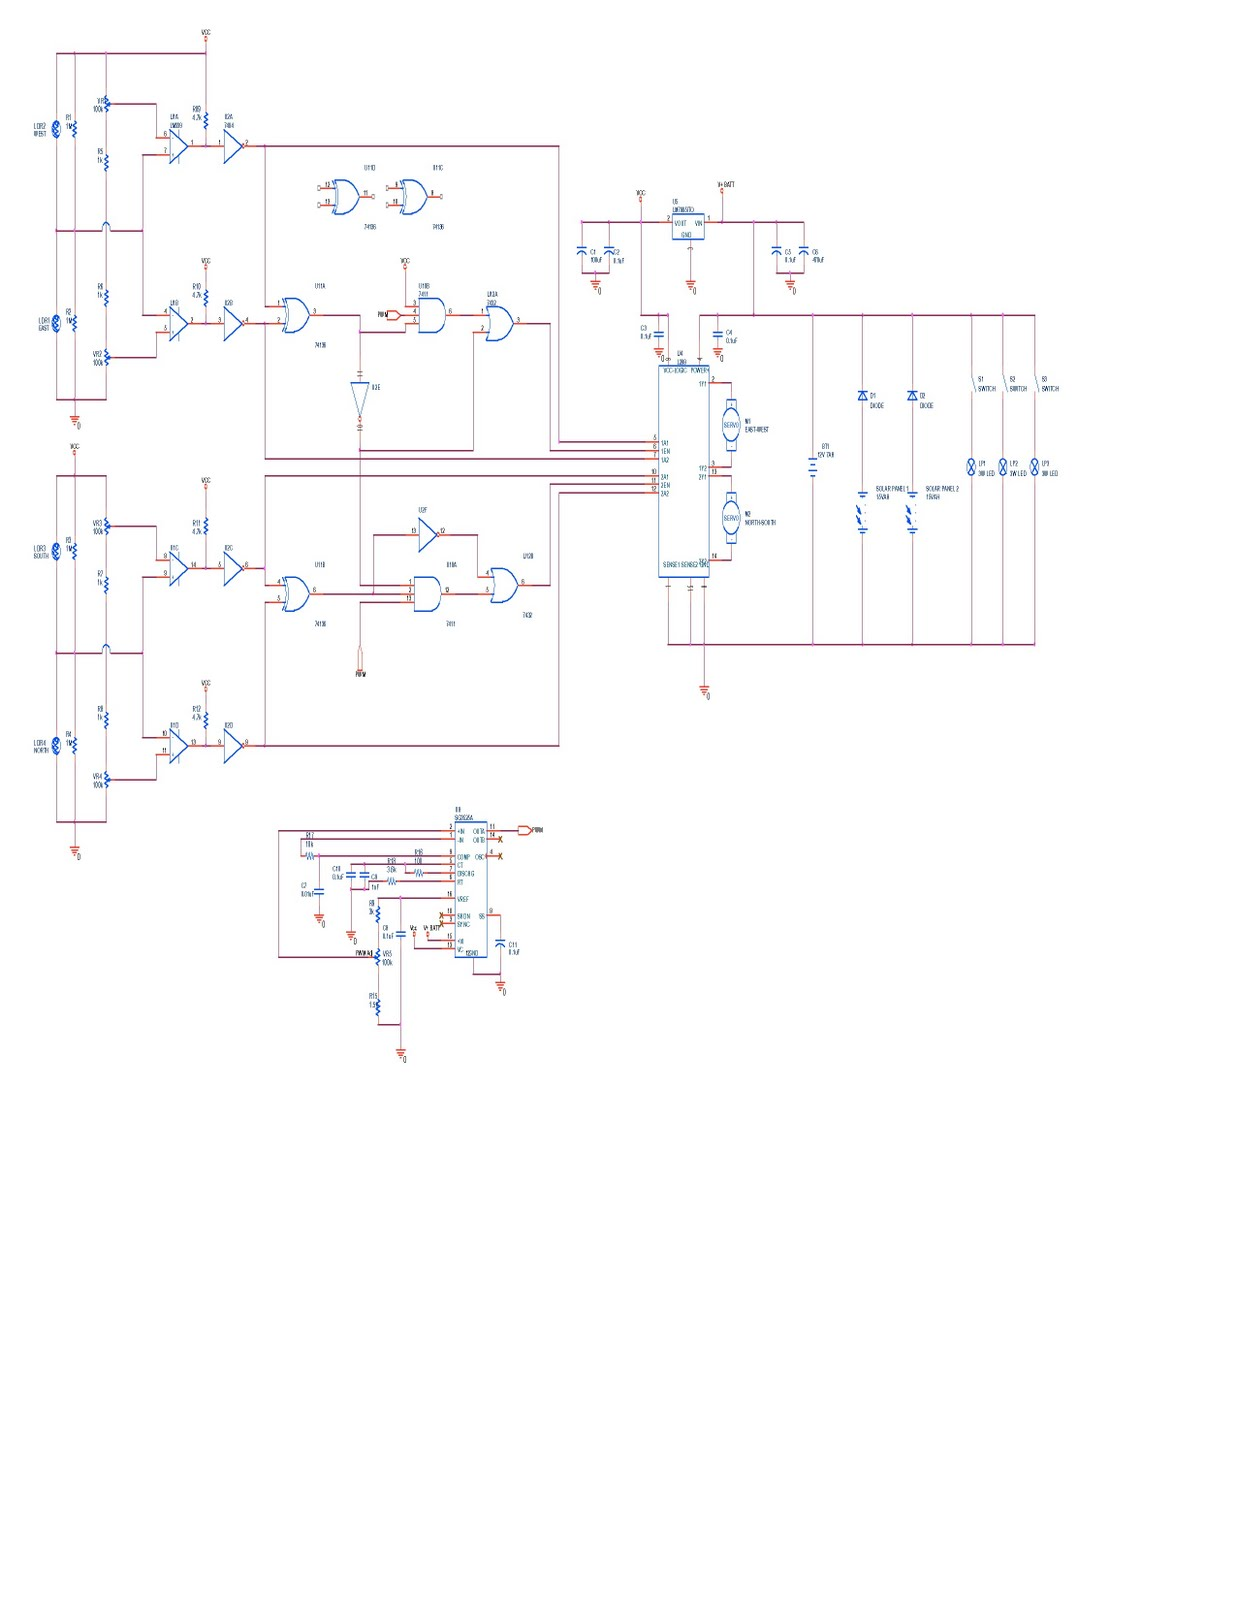 medium resolution of gainamplifier1 amplifiercircuit circuit diagram seekiccom data coaxial cable driver circuit diagram tradeoficcom